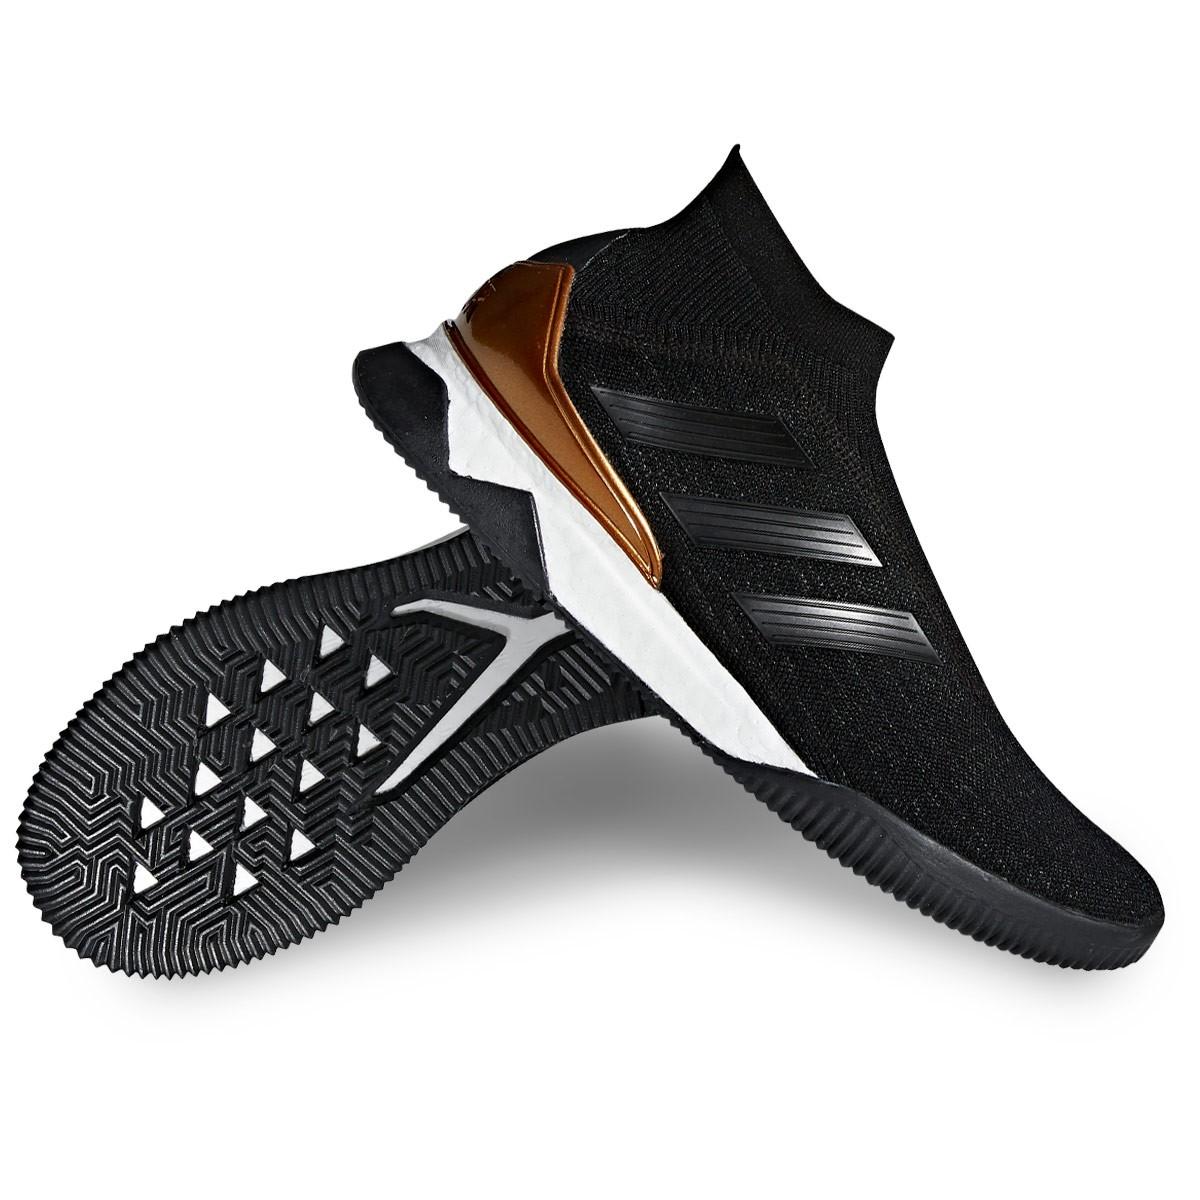 0695068b654c Trainers adidas Predator Tango 18+ TR UltraBoost Core black-Solar ...